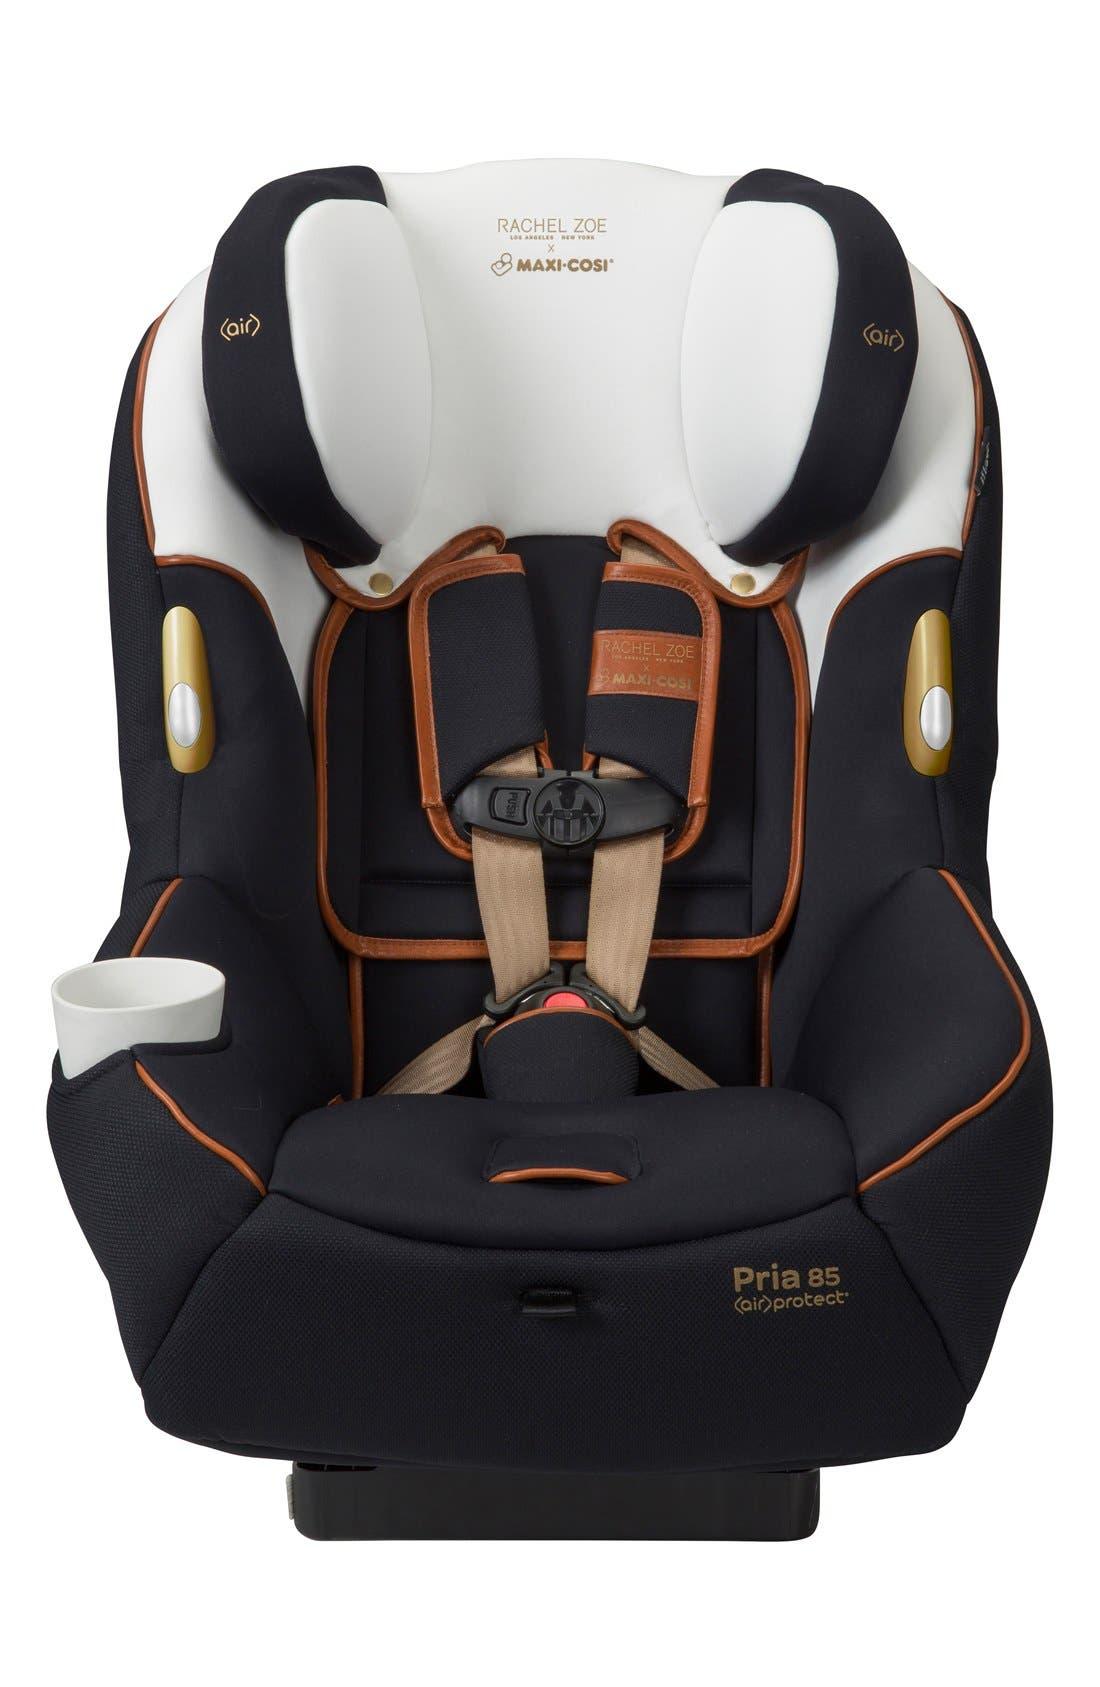 Infant MaxiCosi X Rachel Zoe Pria(TM) 85  Special Edition Car Seat Size One Size  Black